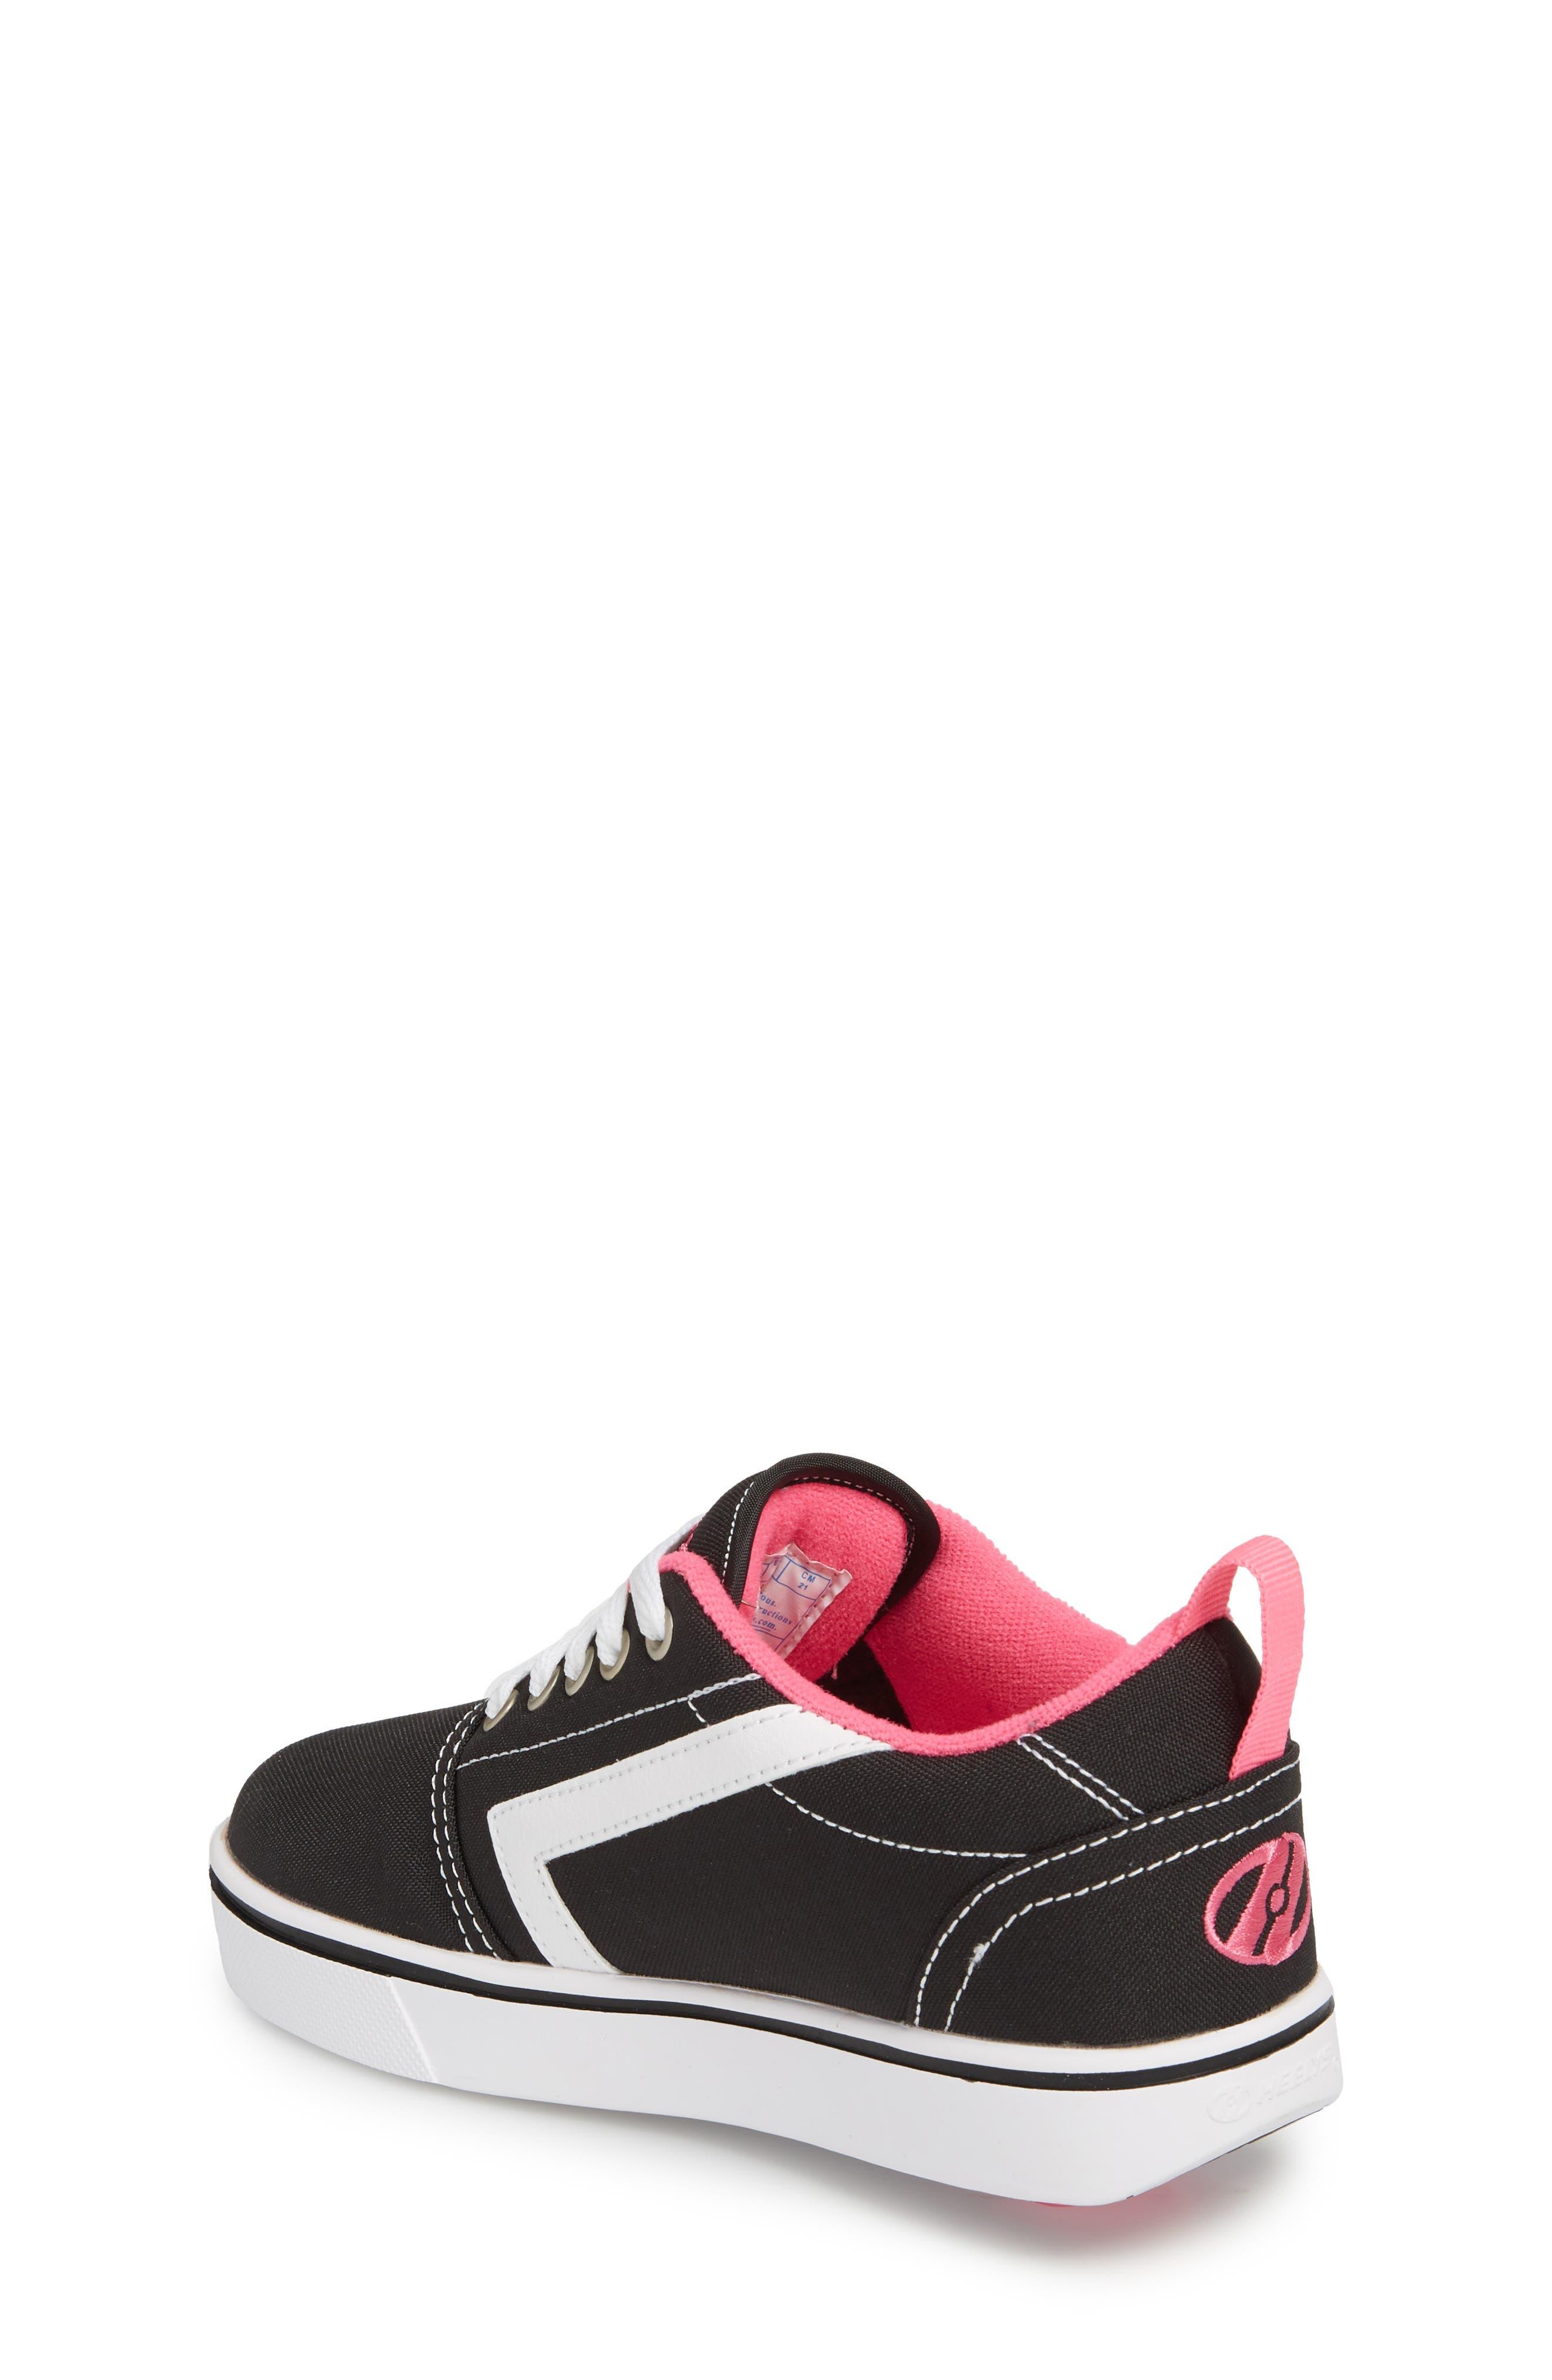 GR8 Pro Wheeled Sneaker,                             Alternate thumbnail 2, color,                             Black/ White/ Hot Pink